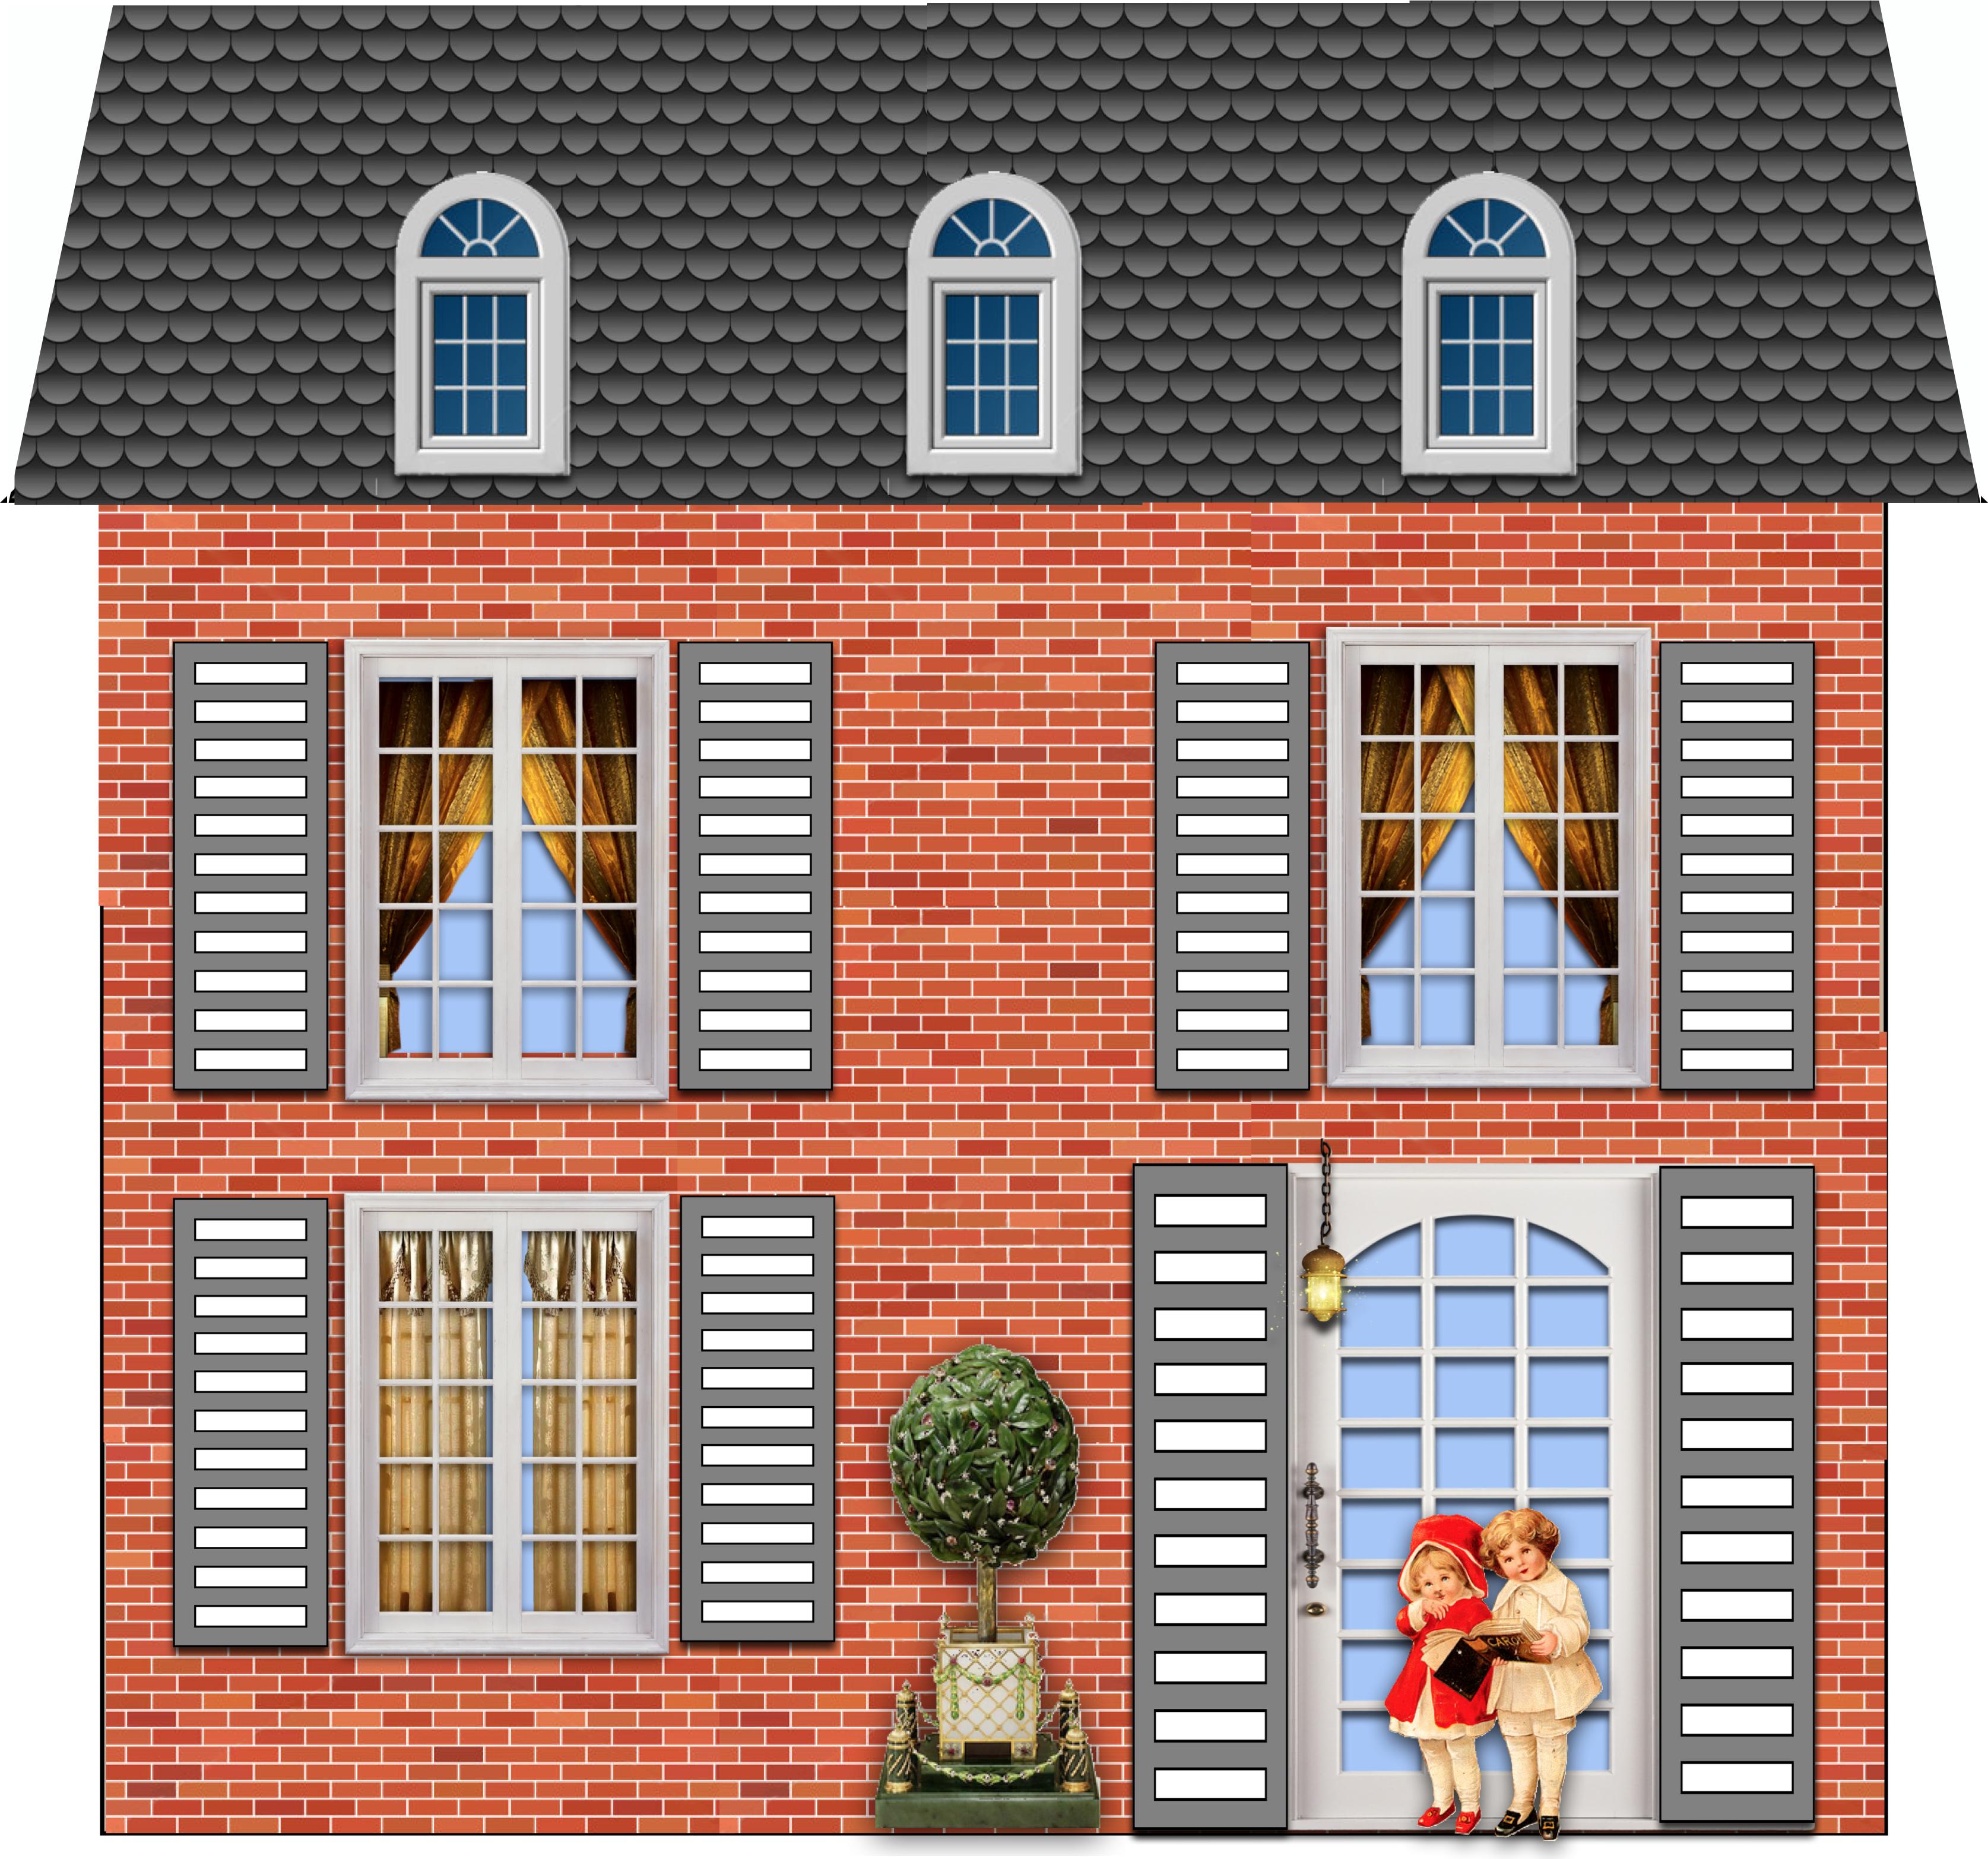 nouvelles petites maisons imprimer et d couper babanew. Black Bedroom Furniture Sets. Home Design Ideas